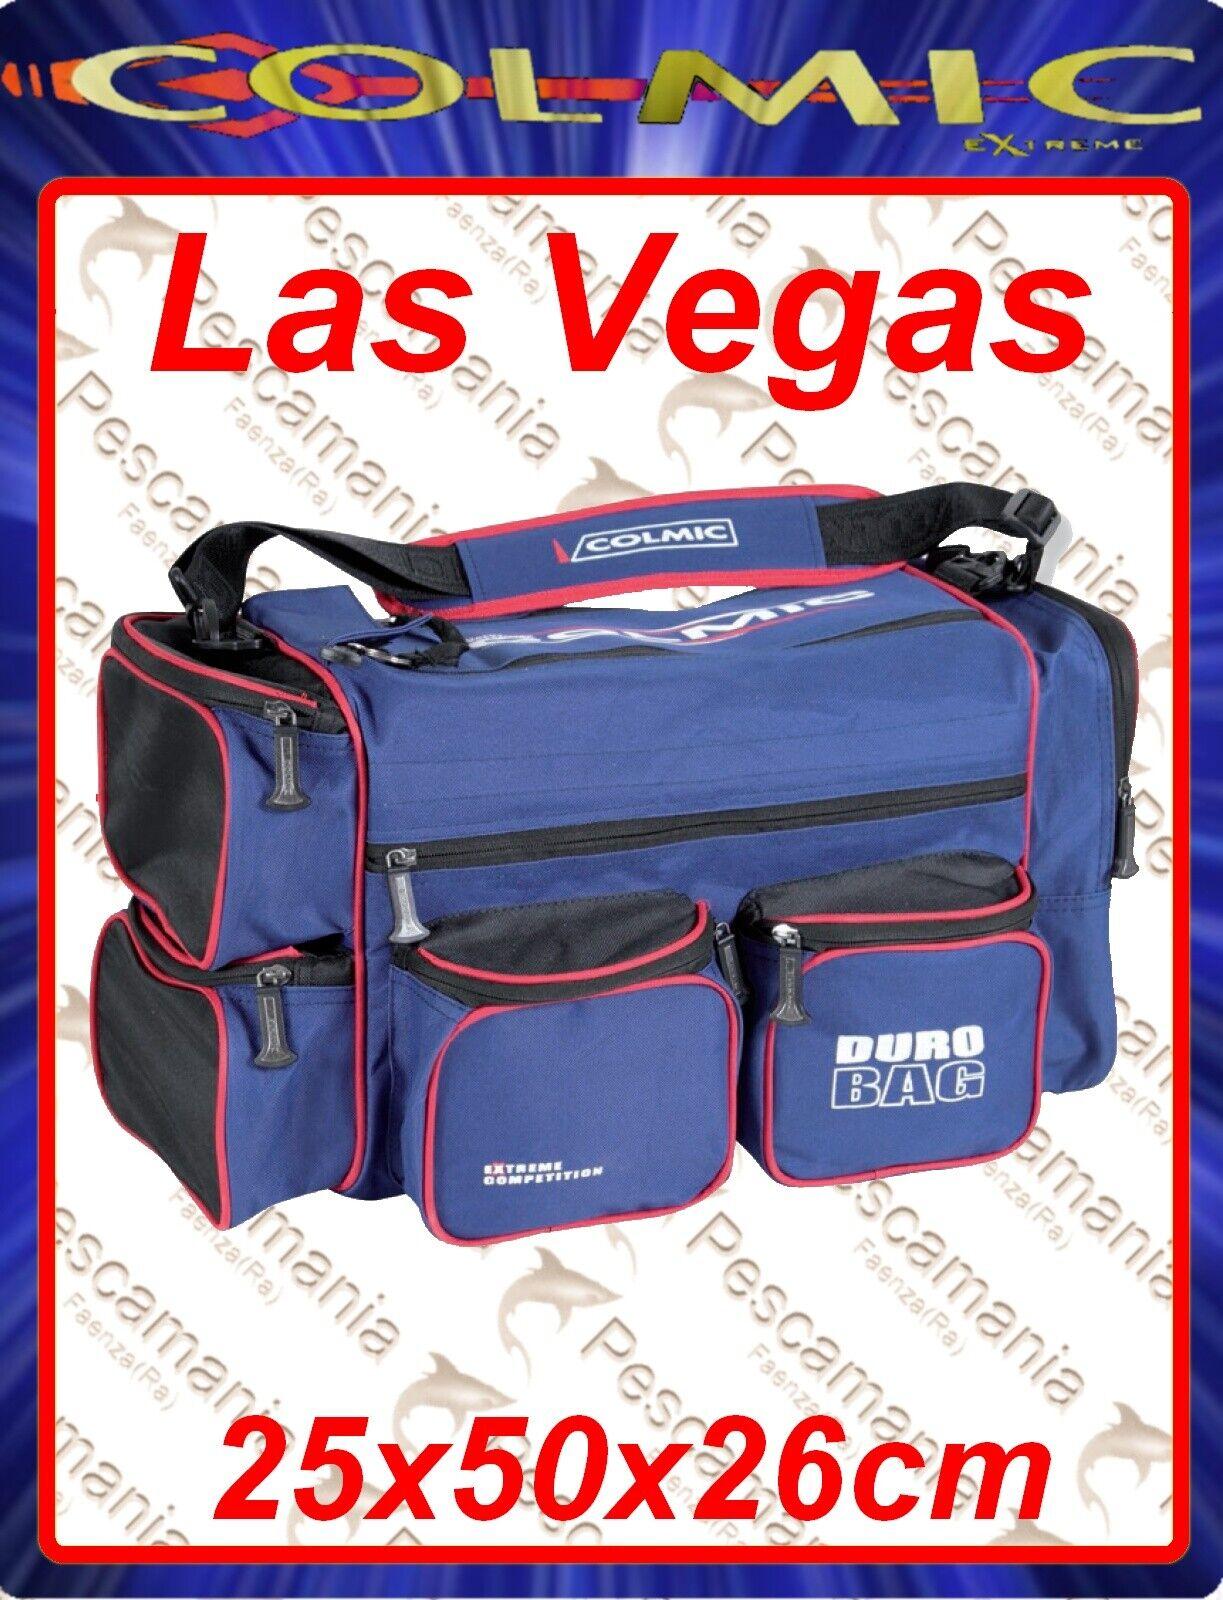 Borsa Colmic Extreme Las Vegas rouge series 25x50x26cm